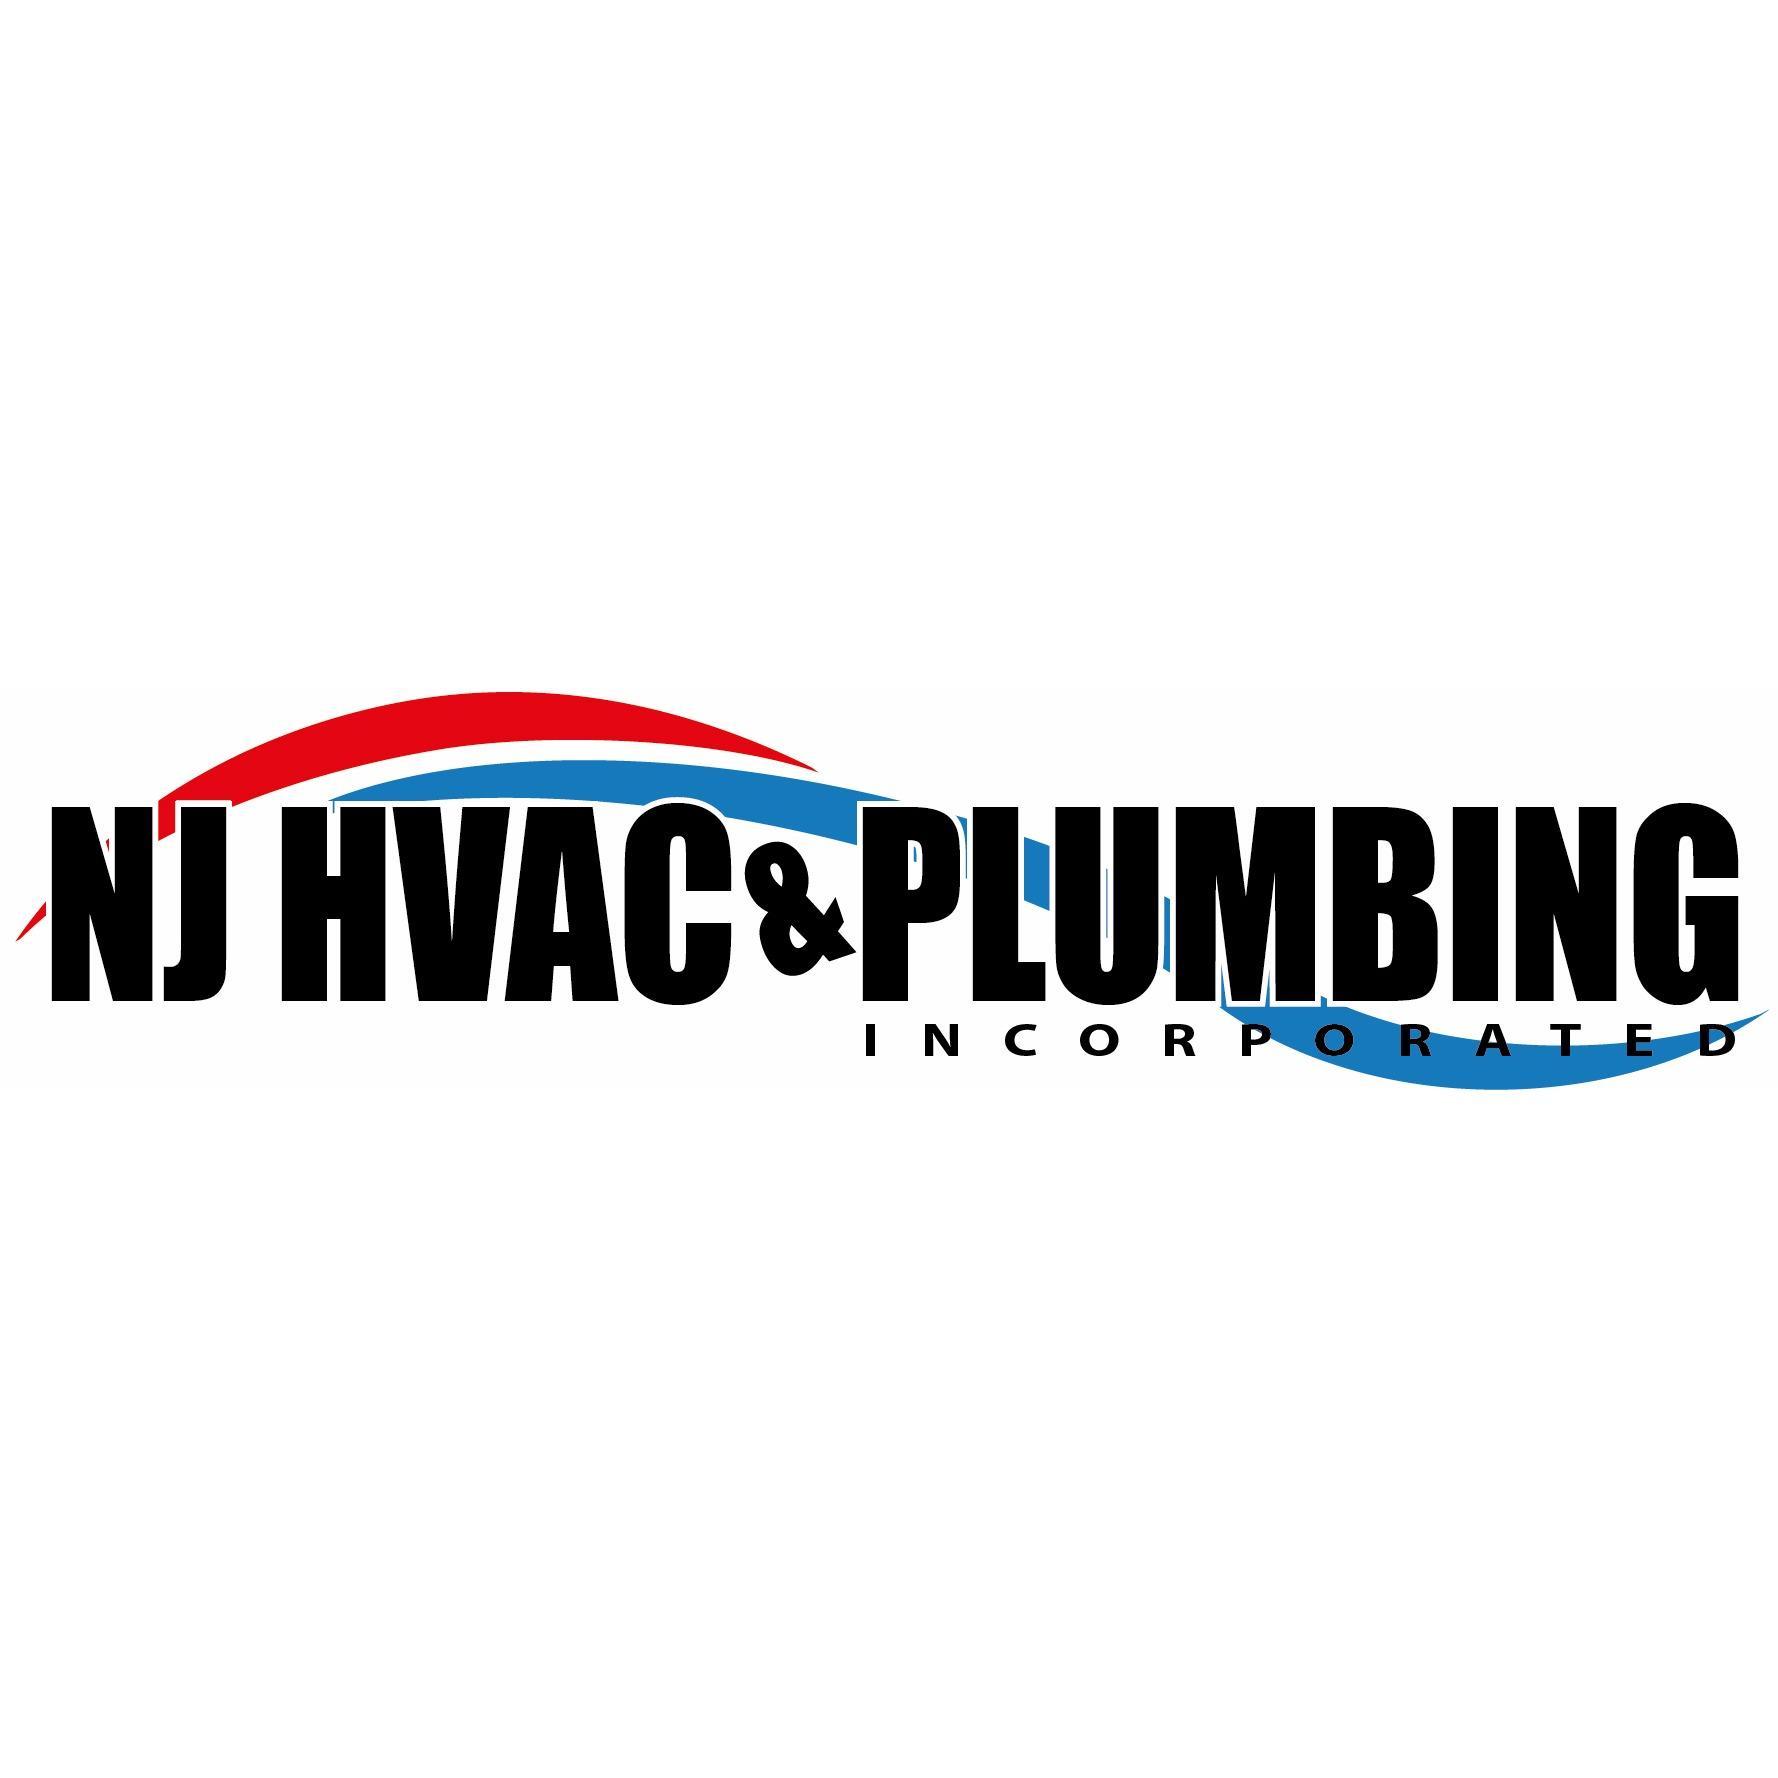 NJ HVAC & Plumbing